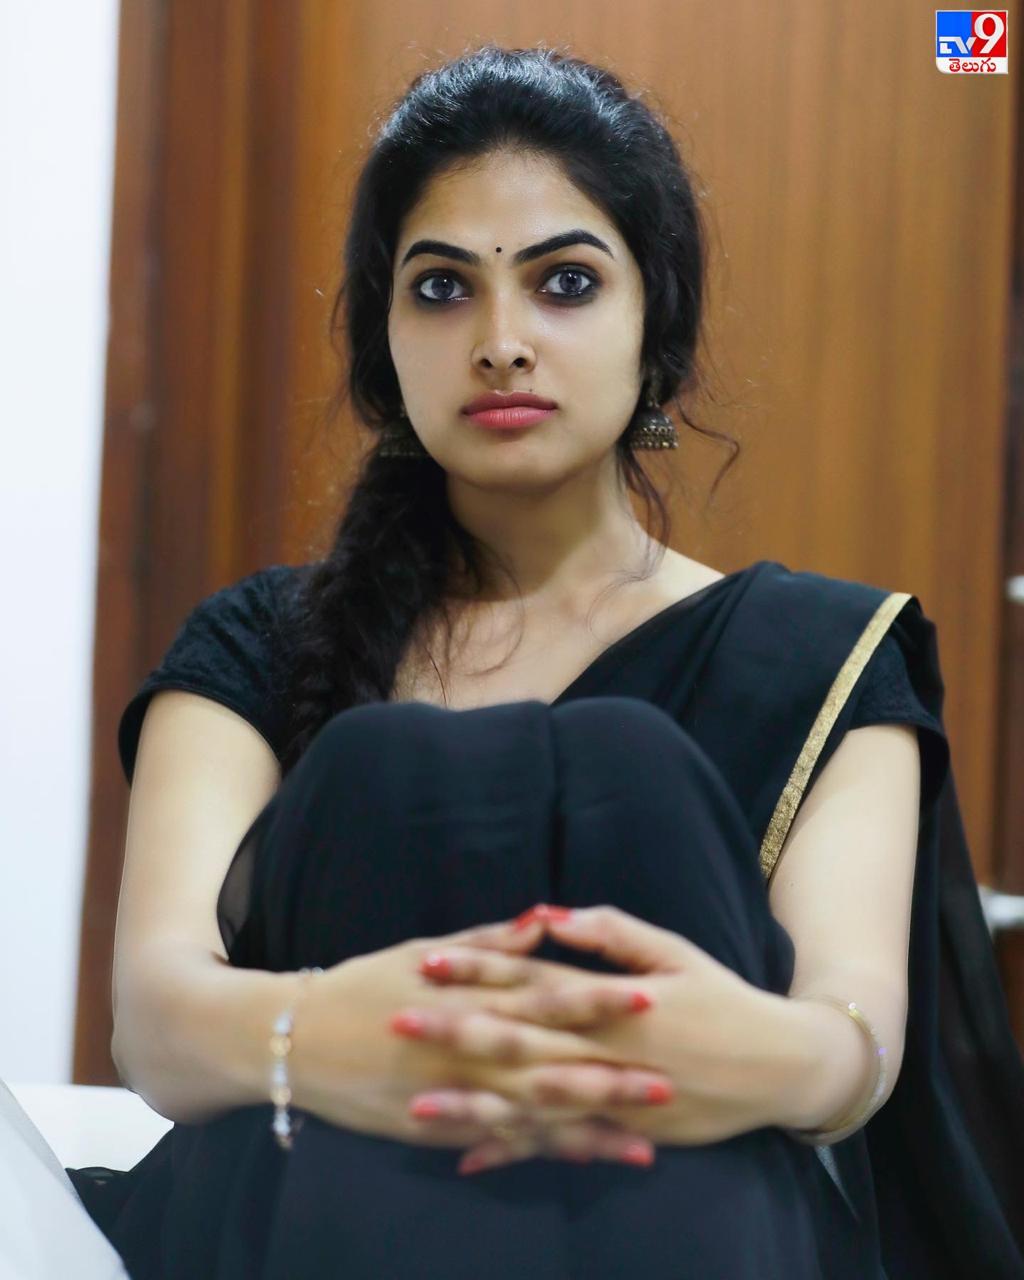 Divi vadthya, బిగ్ బాస్ 4 ఫేమ్ దివి వాద్త్యా